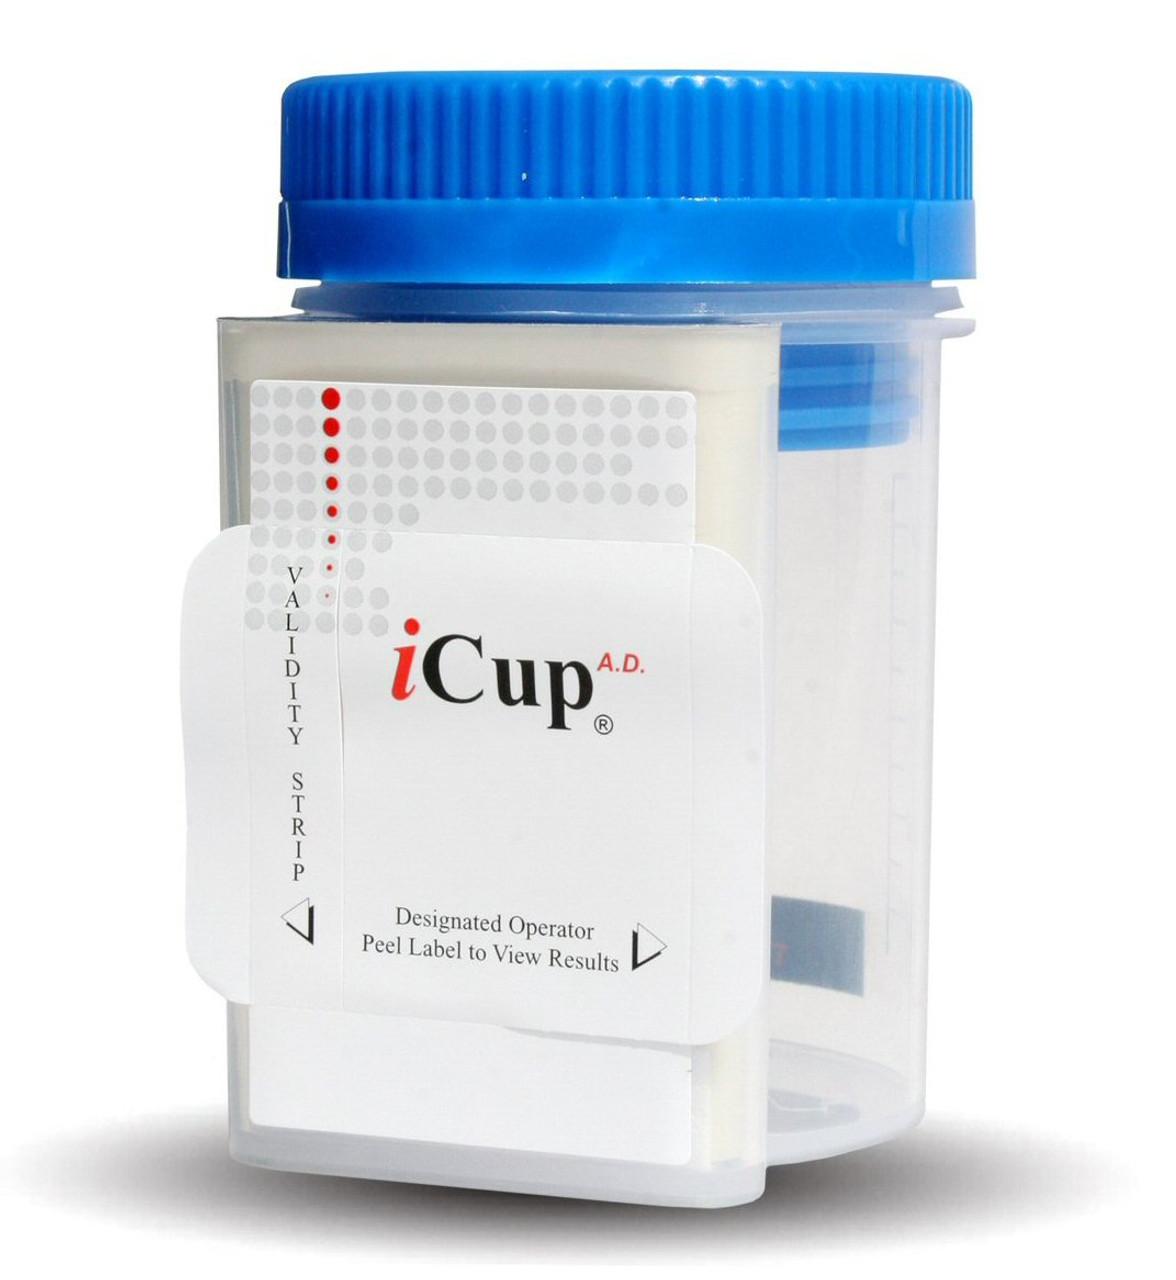 iCup 9 Panel Abbott / Alere Diagnostics Rapid Drug Test Cup with Specimen Validity